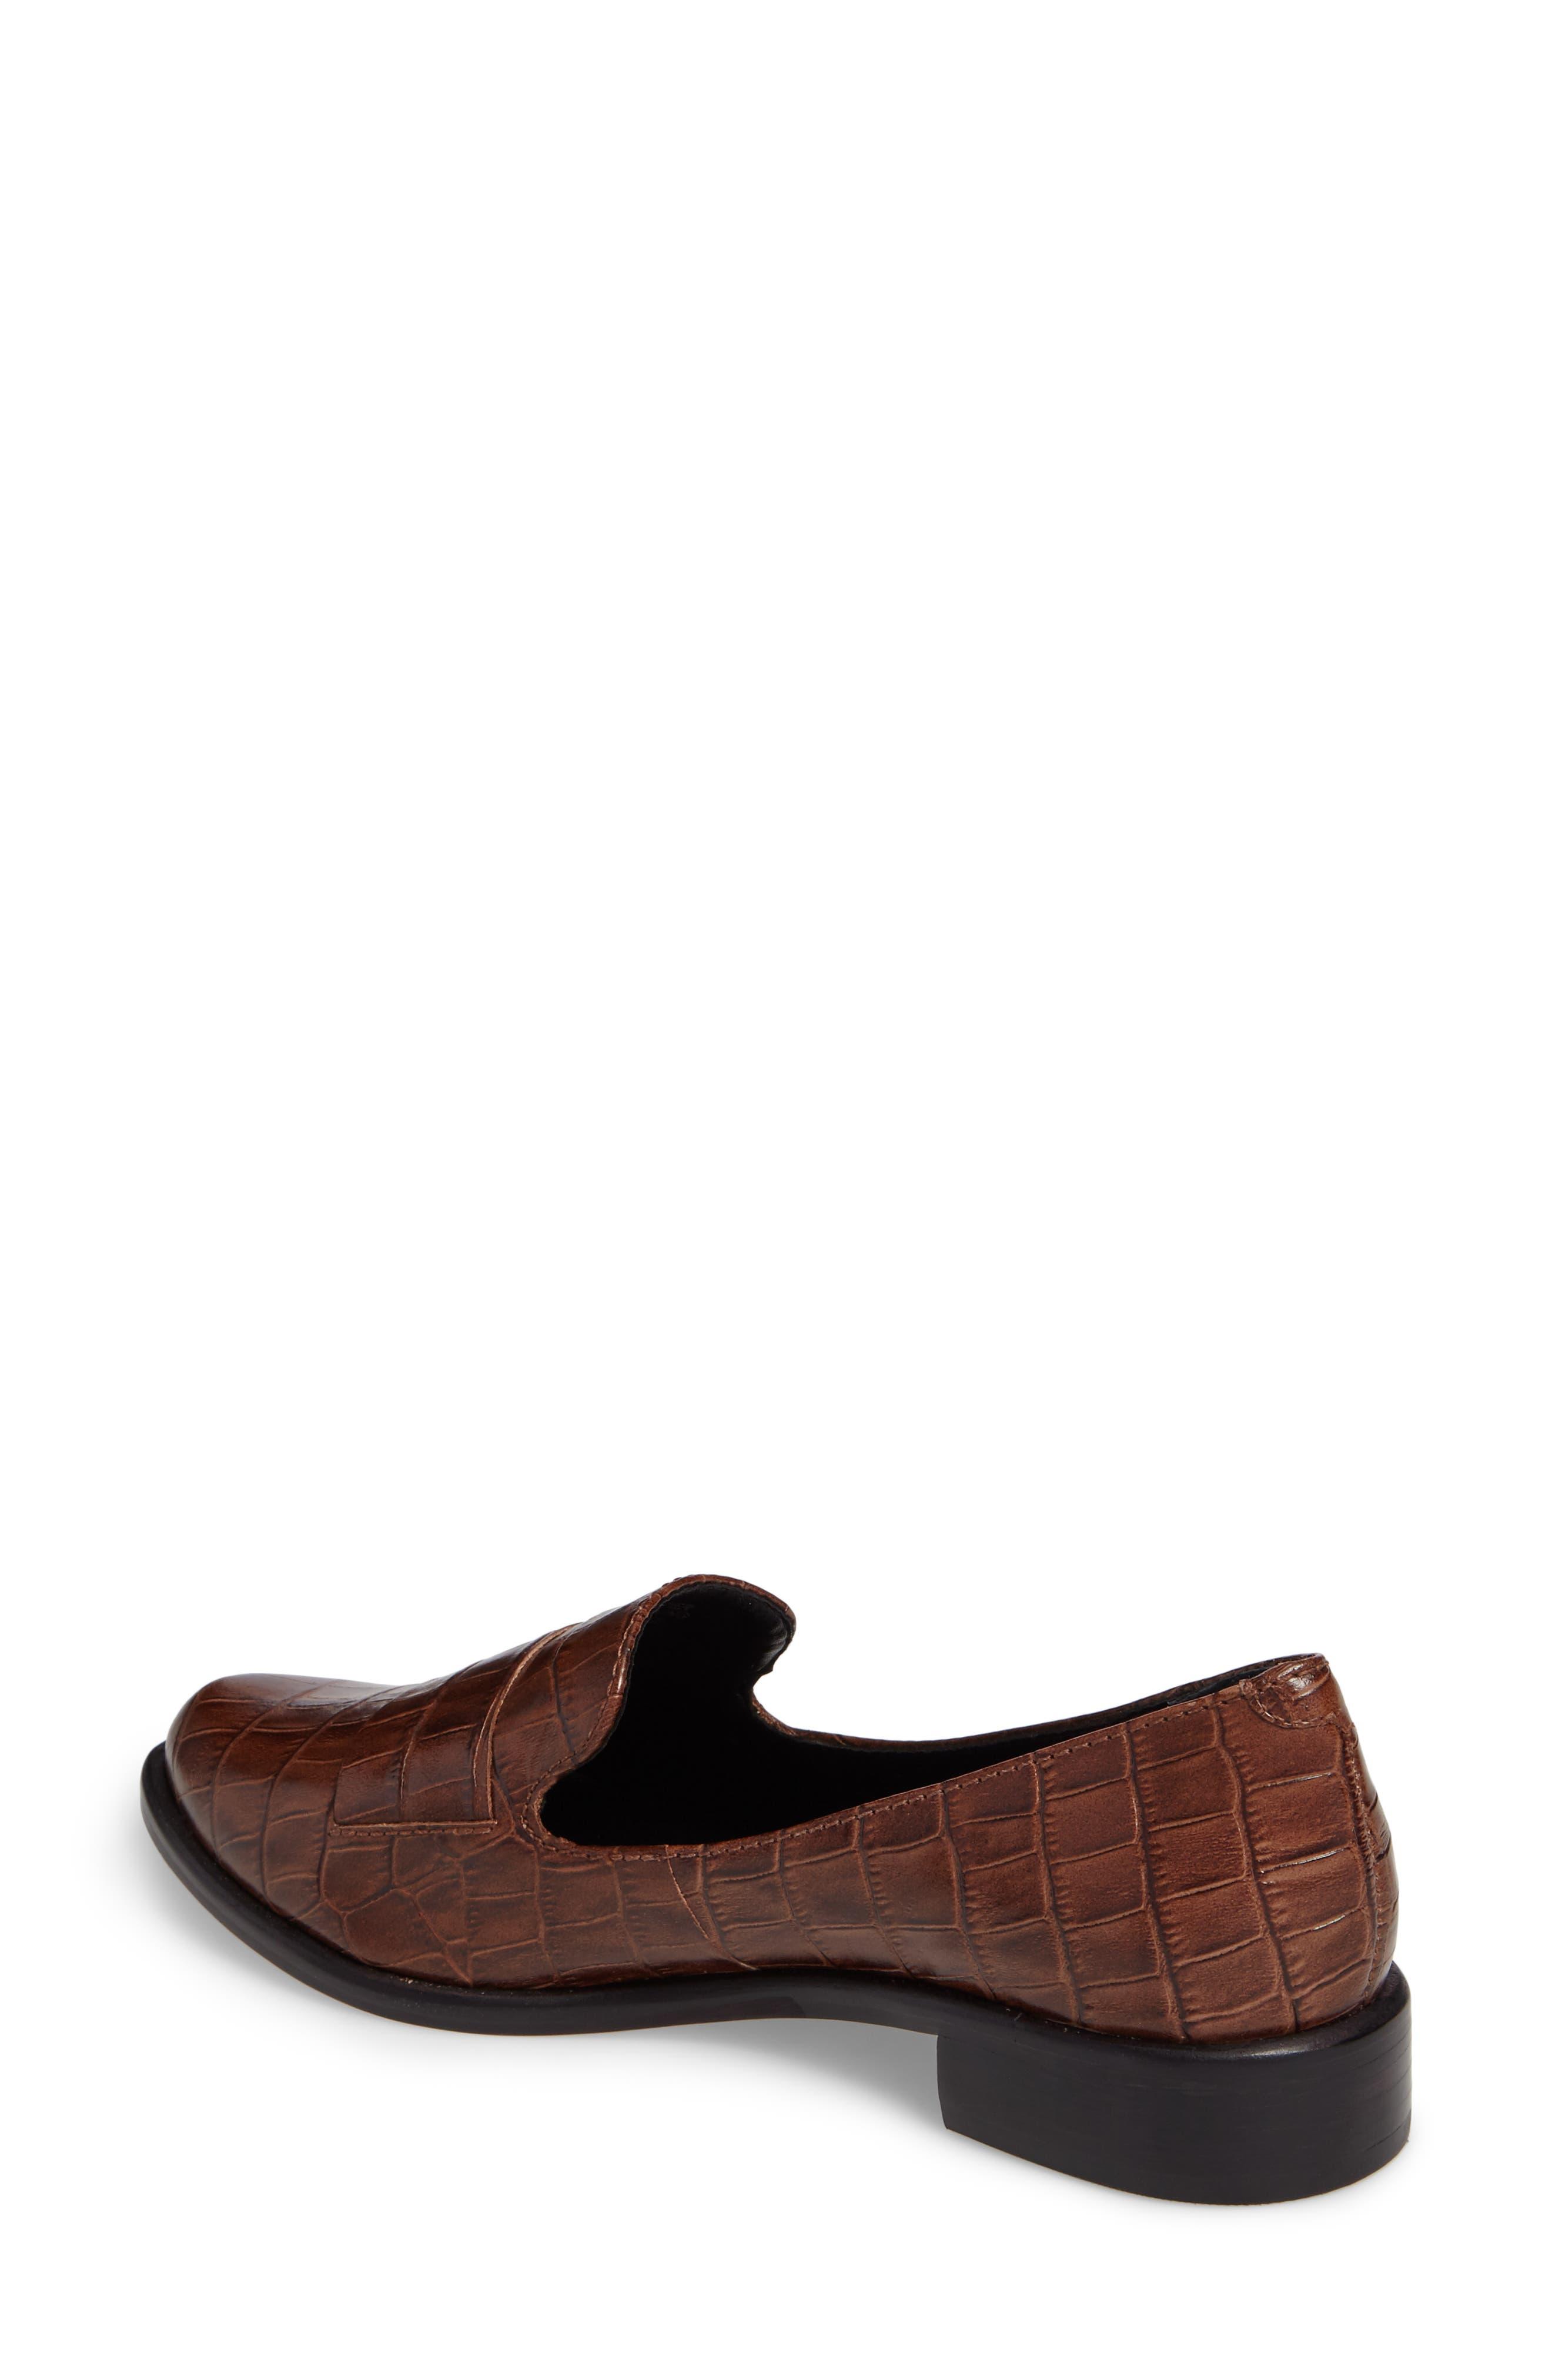 M4D3 'Ocean' Flat Loafer,                             Alternate thumbnail 10, color,